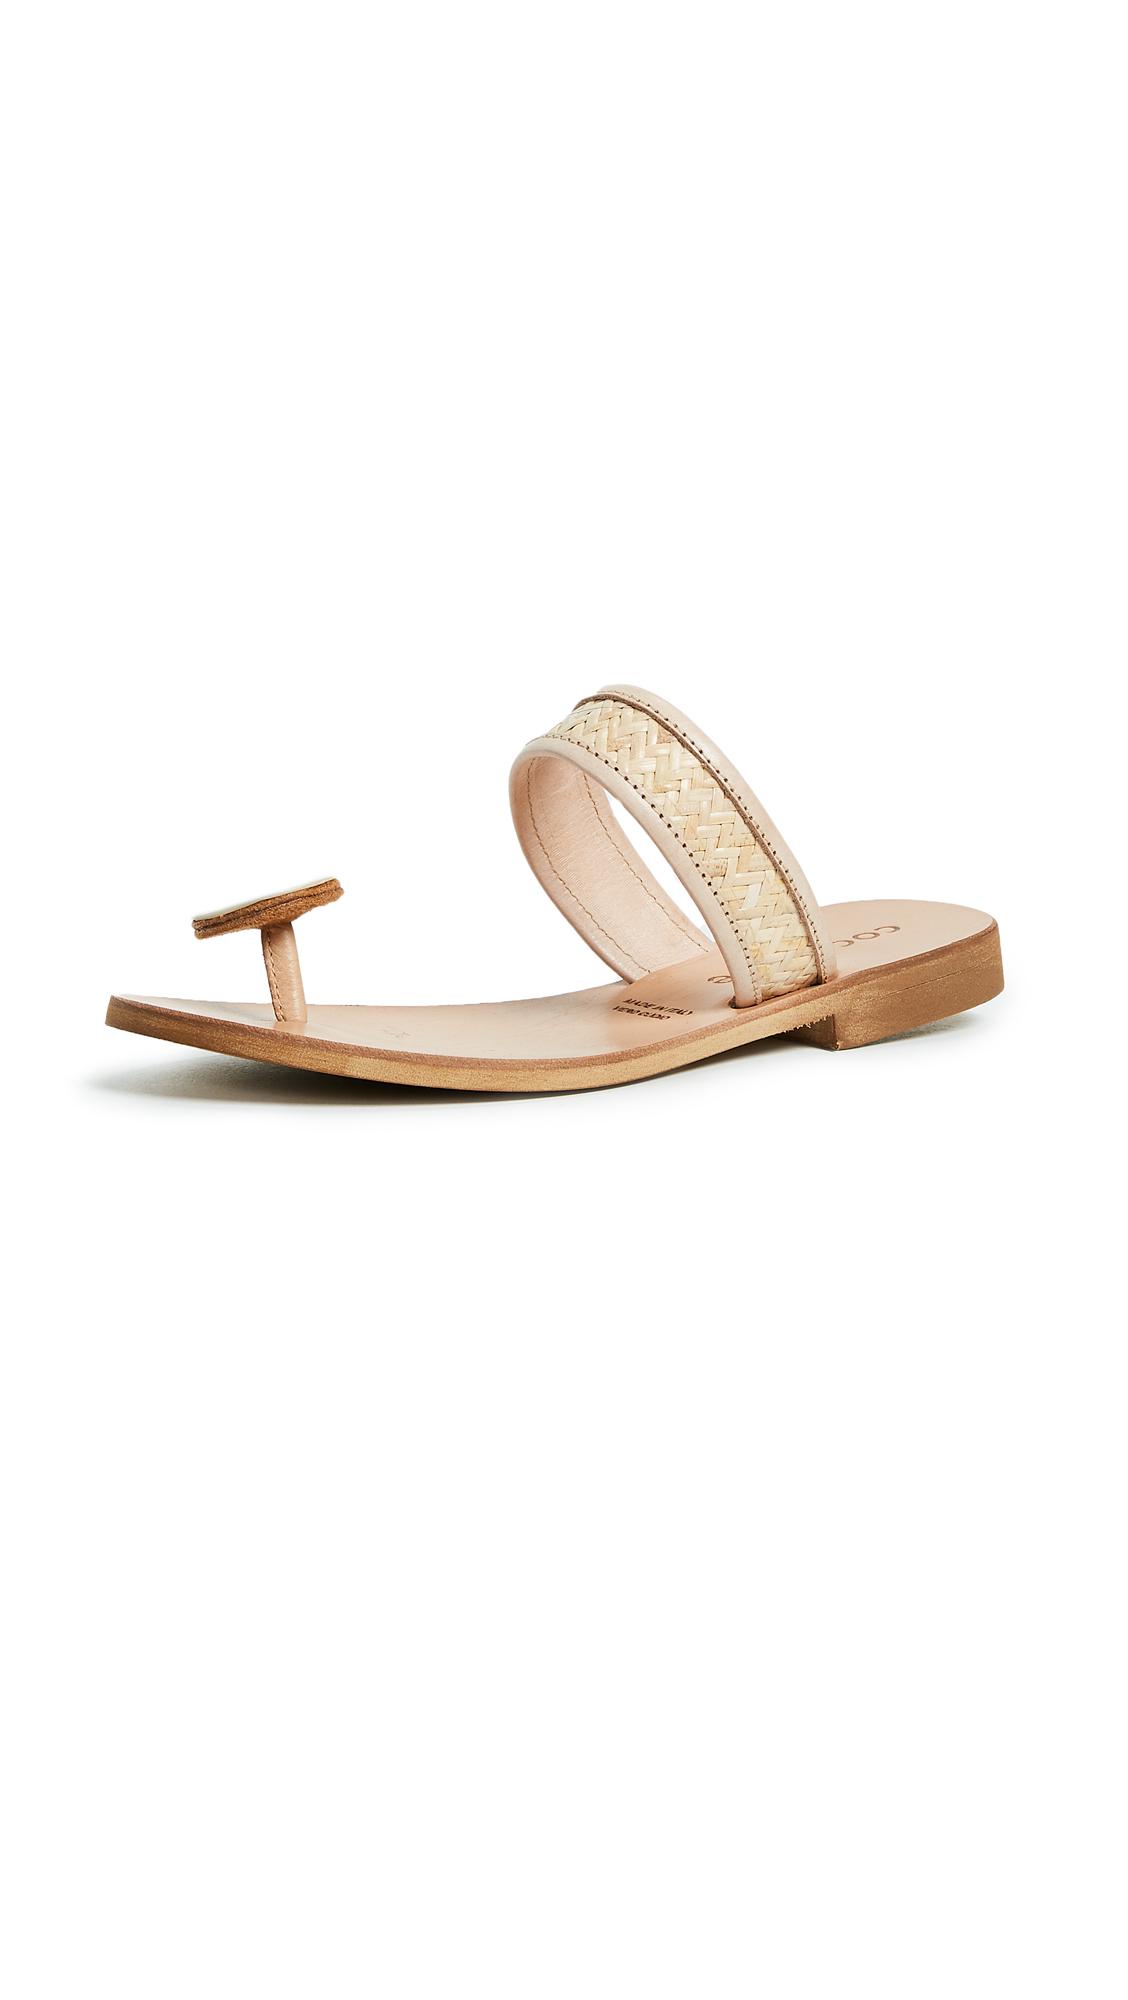 Cocobelle Delfina Sandals - Sand